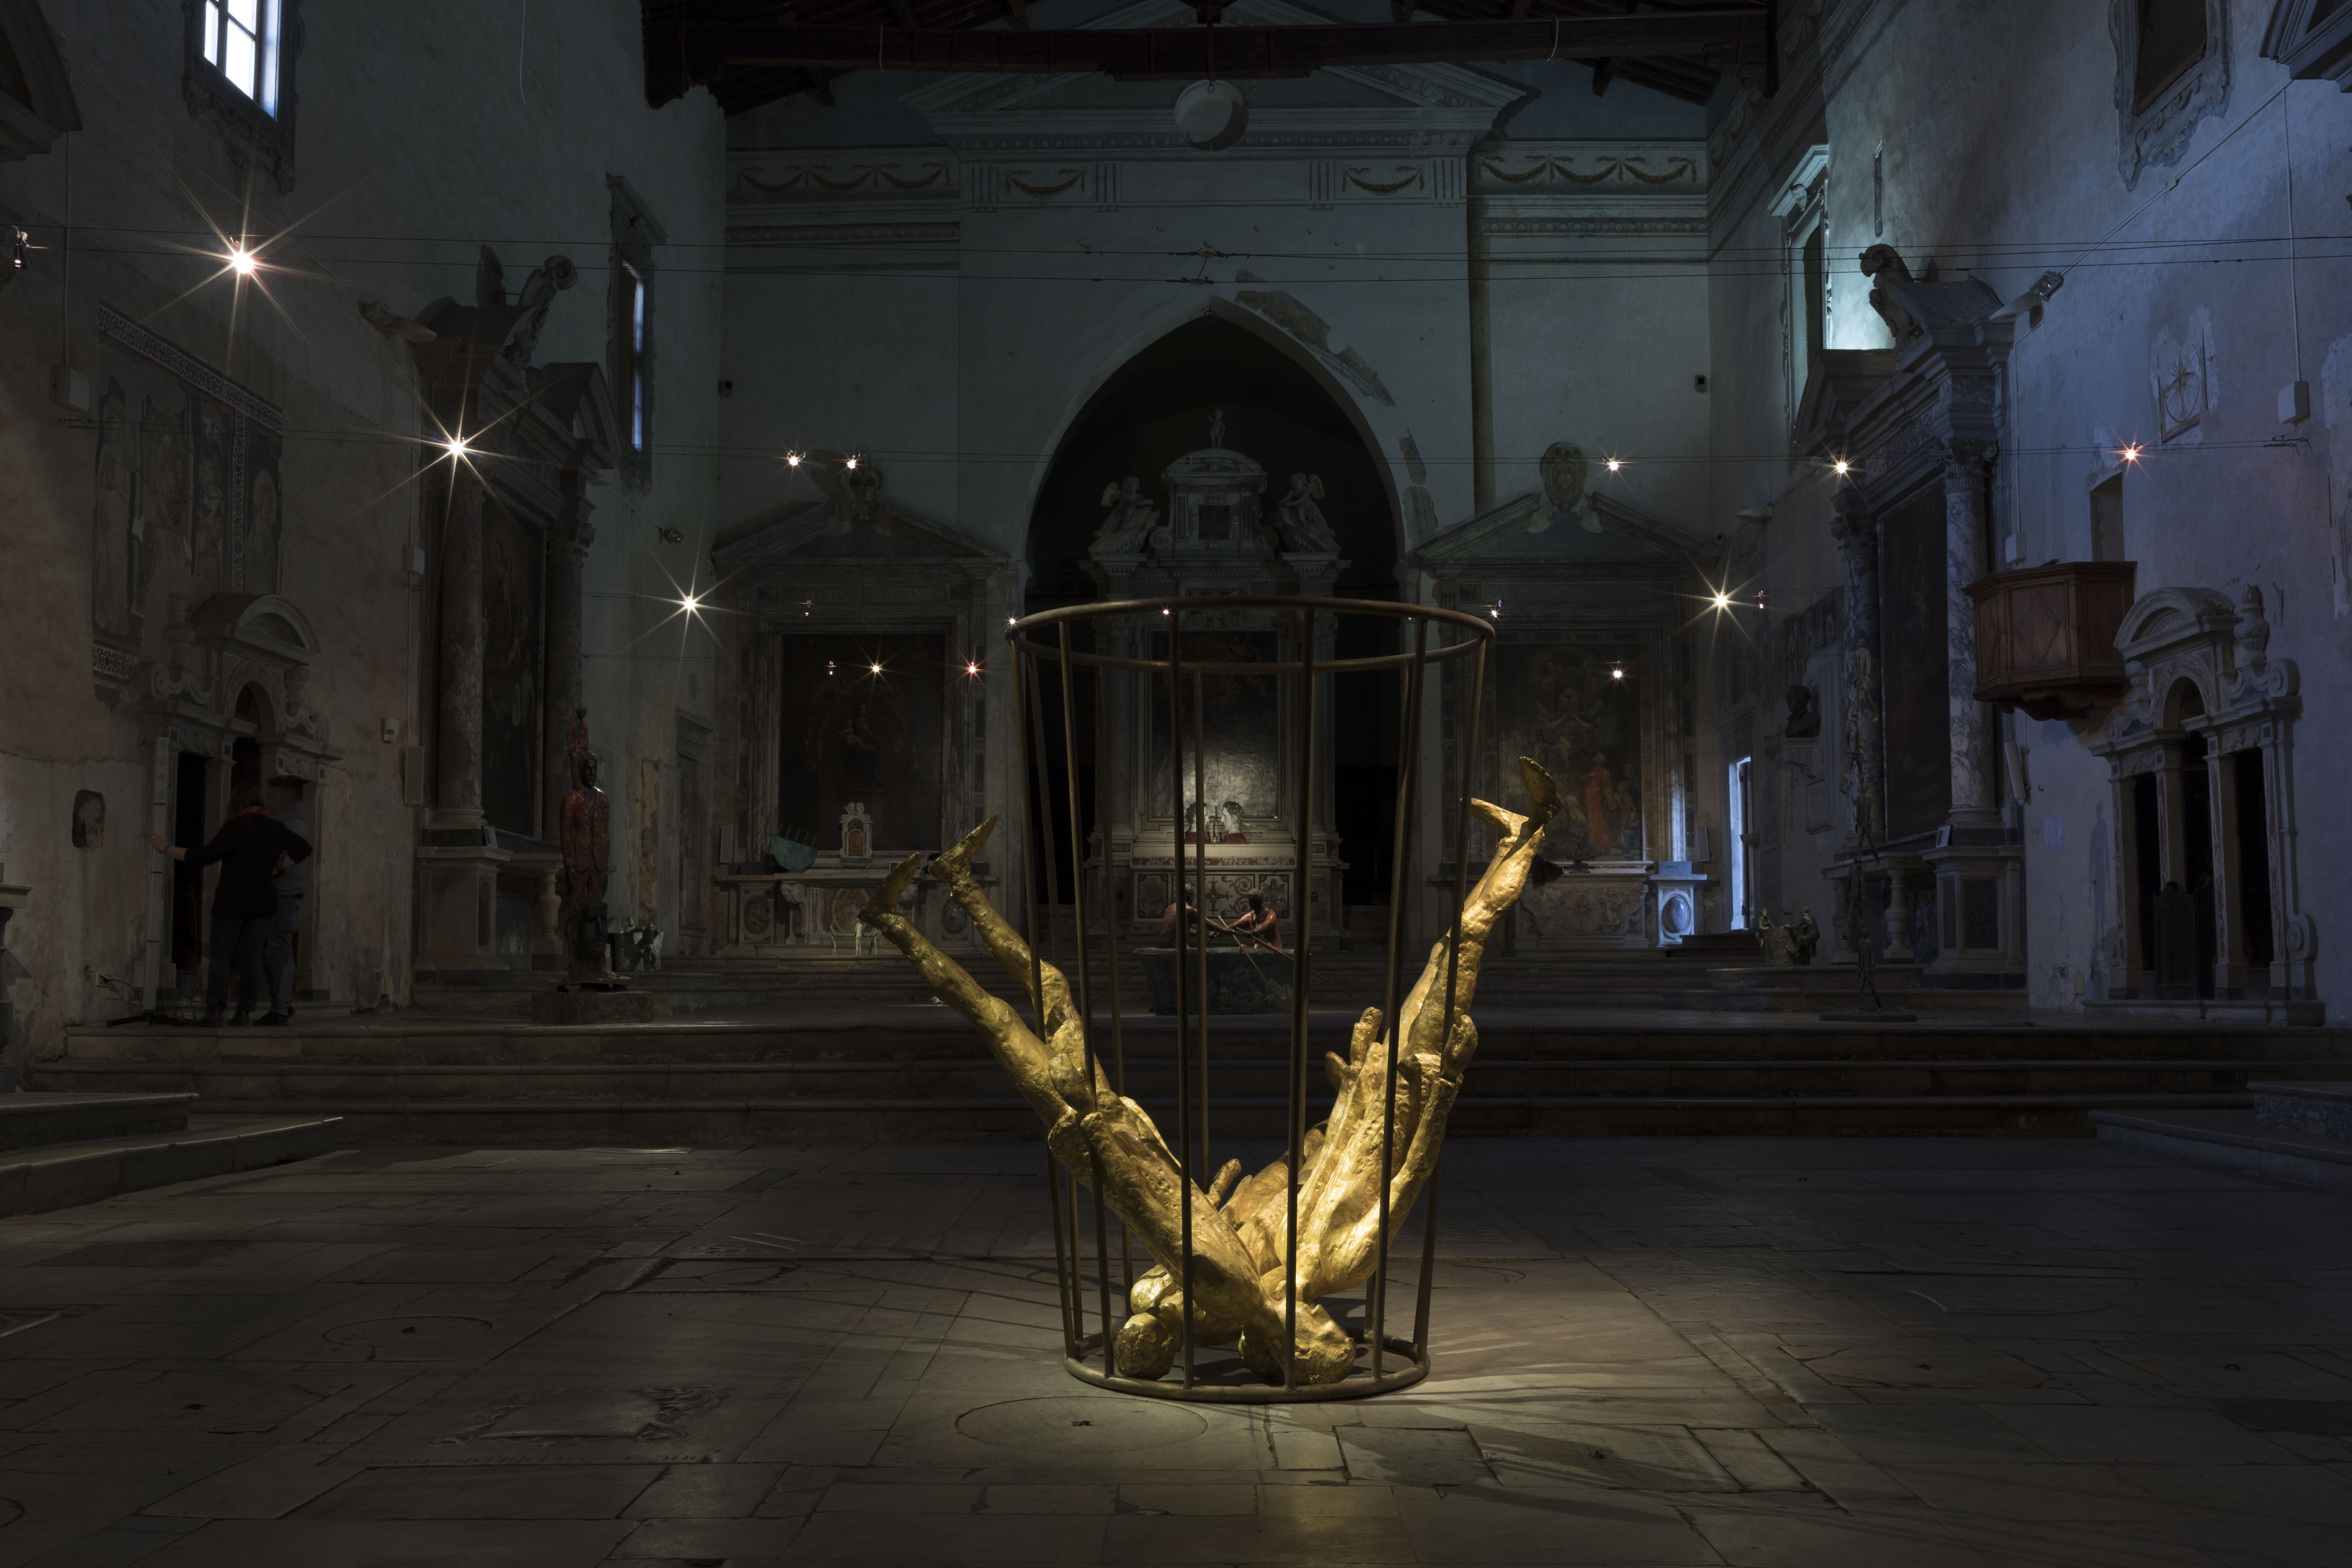 Giardinia Pietrasanta Orario : Roberto barni in mostra a pietrasanta zest